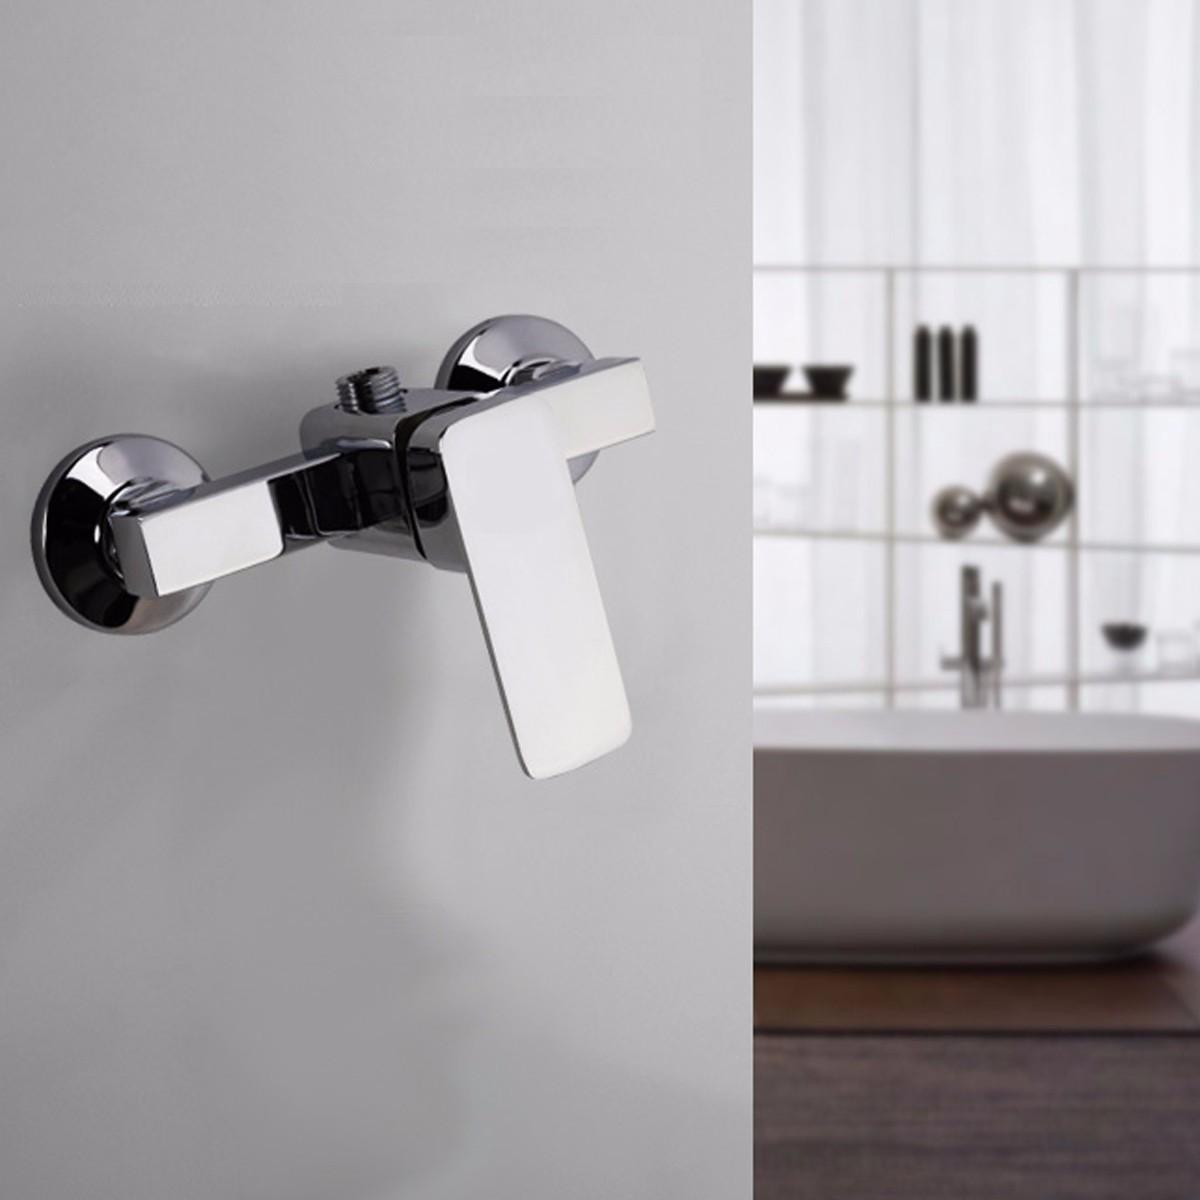 Alloy Bathroom Shower Bathtub Faucet Mixer Mixing Valve Water Tap Durable